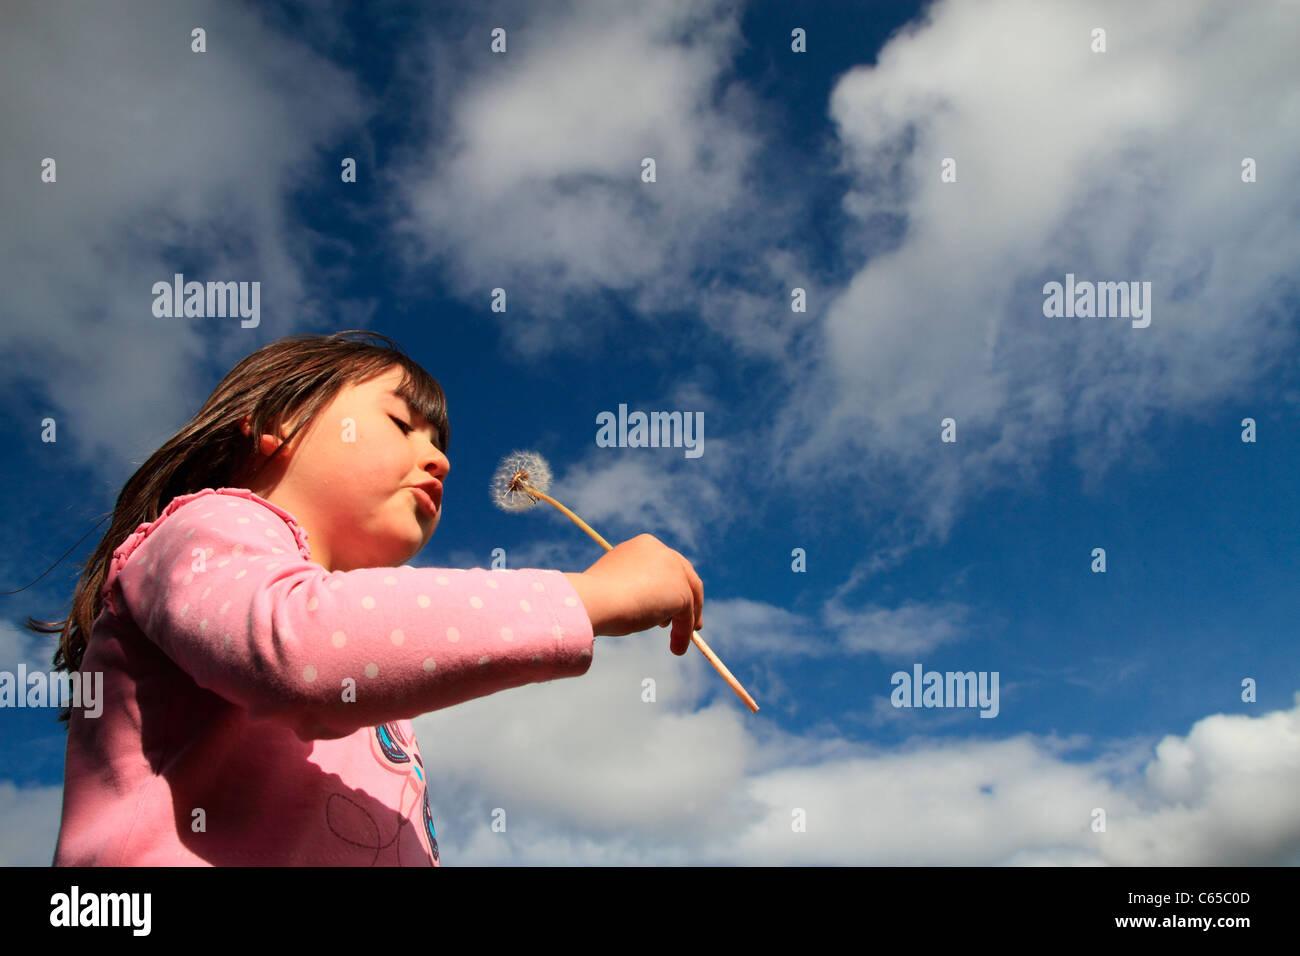 Girl blowing a dandelion clock - Stock Image